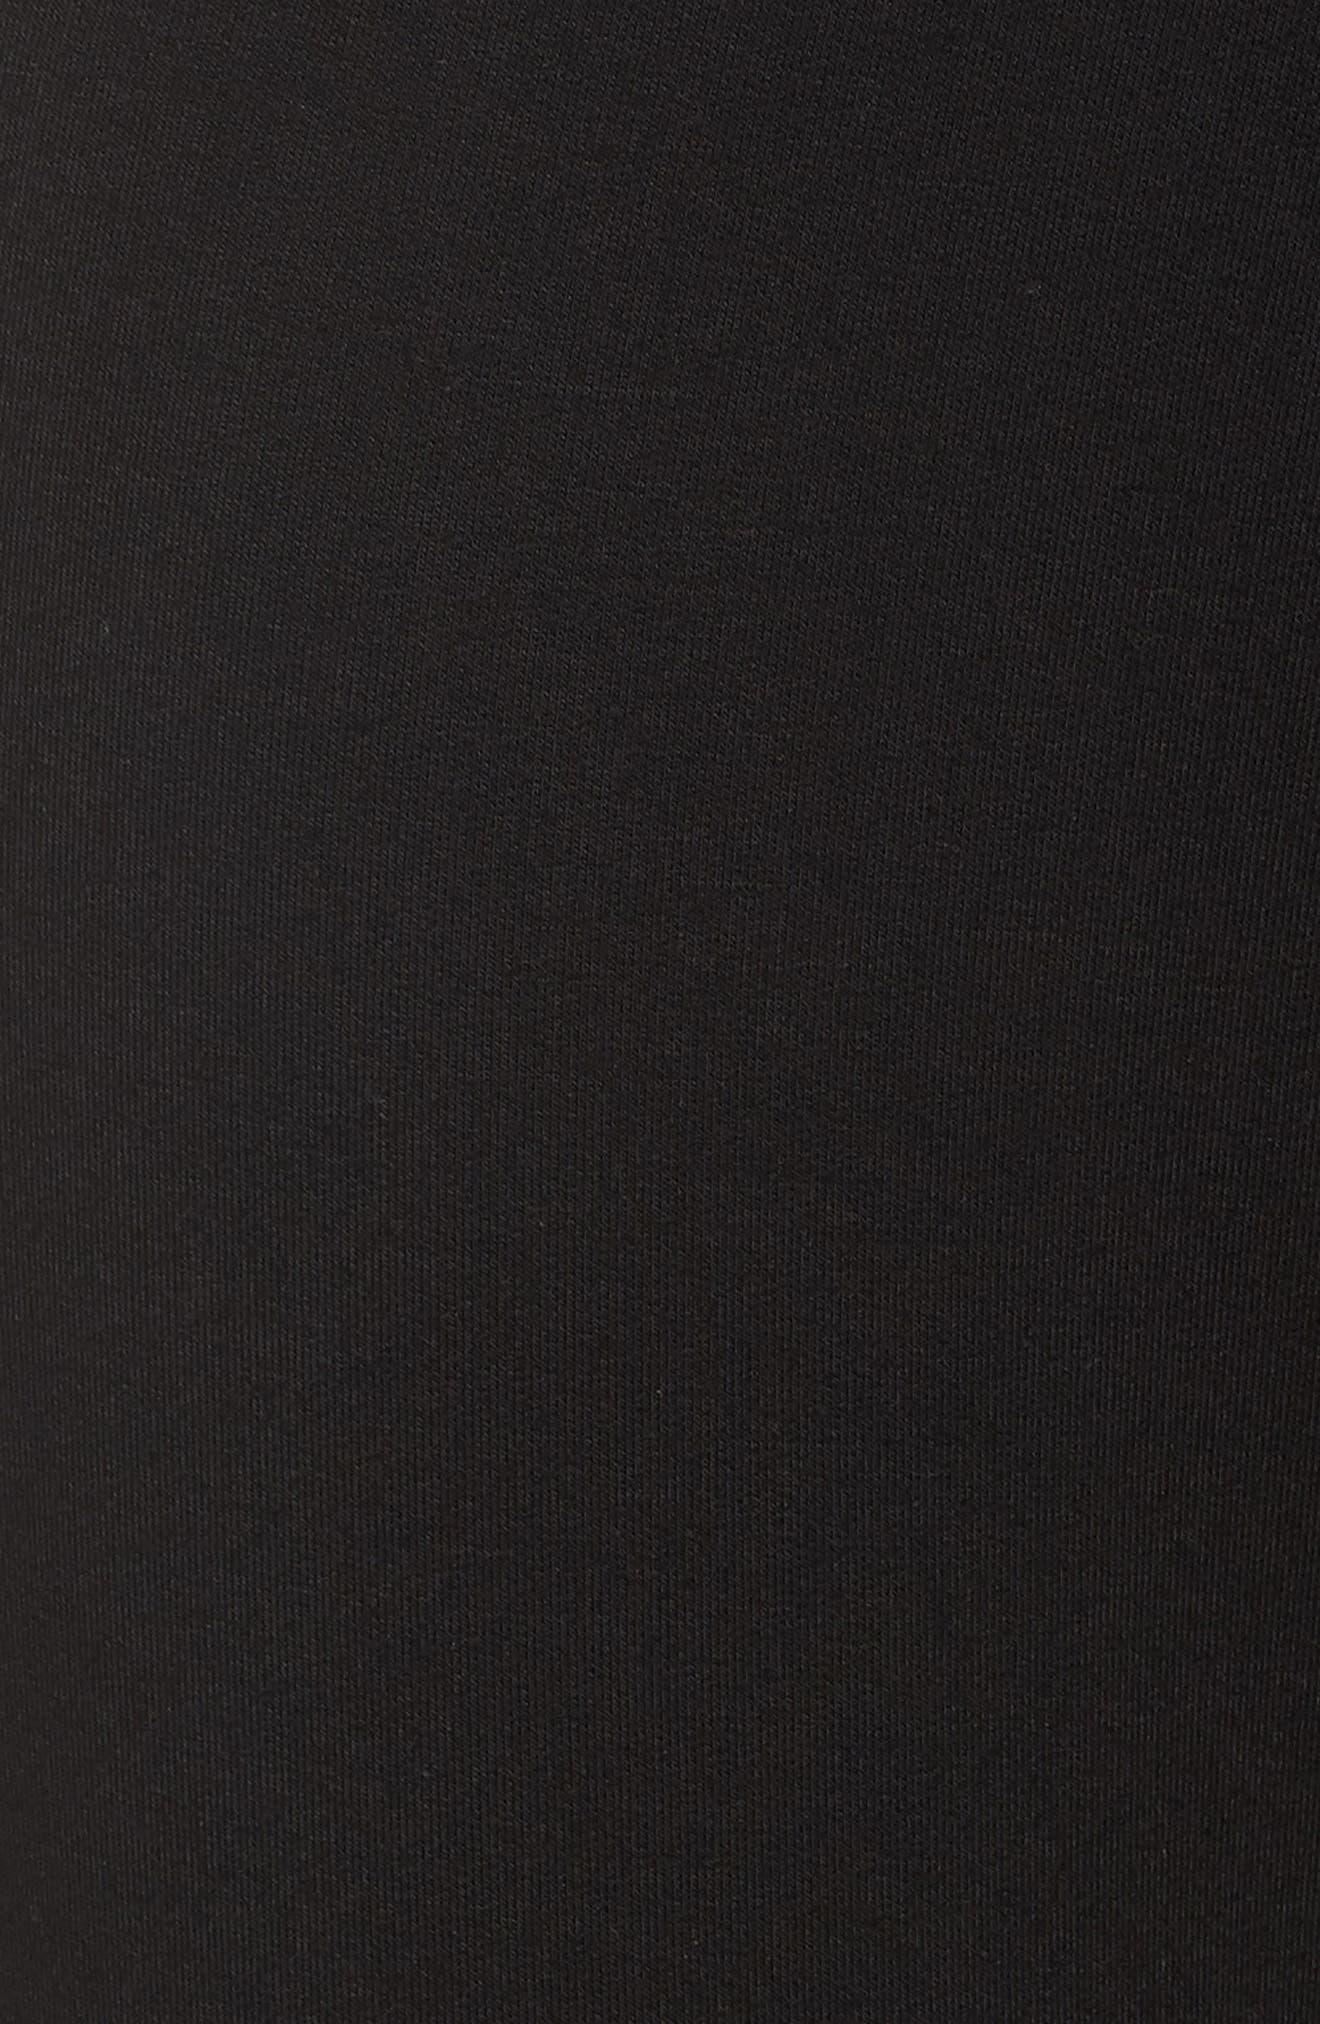 Canyon Jogger Pants,                             Alternate thumbnail 6, color,                             BLACK